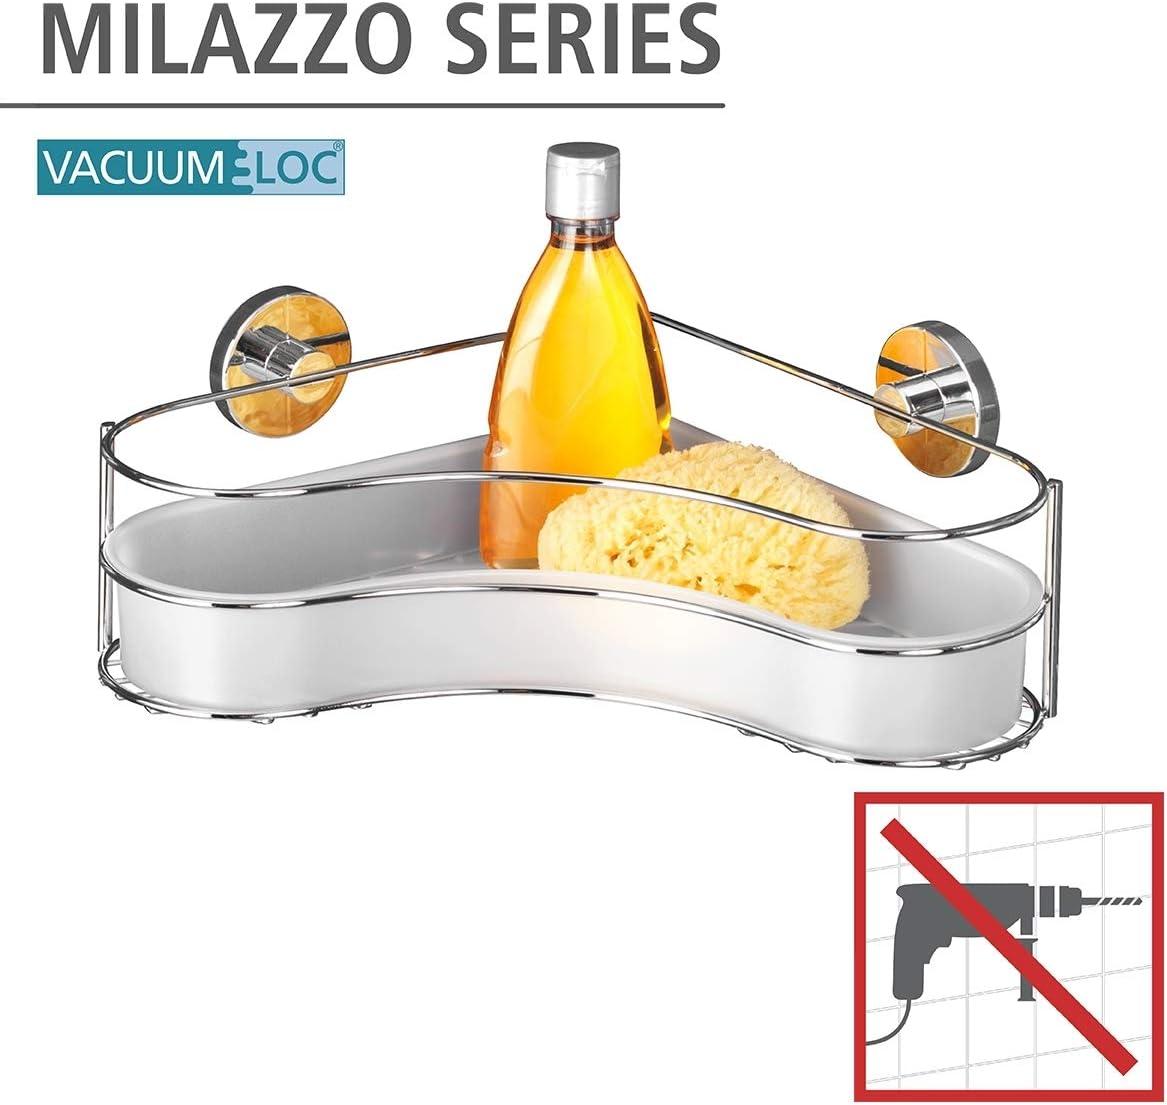 35 x 11.5 x 24 cm WENKO 20894100 Vacuum-Loc rinconera Milazzo Acero fijar sin taladrar Cromo